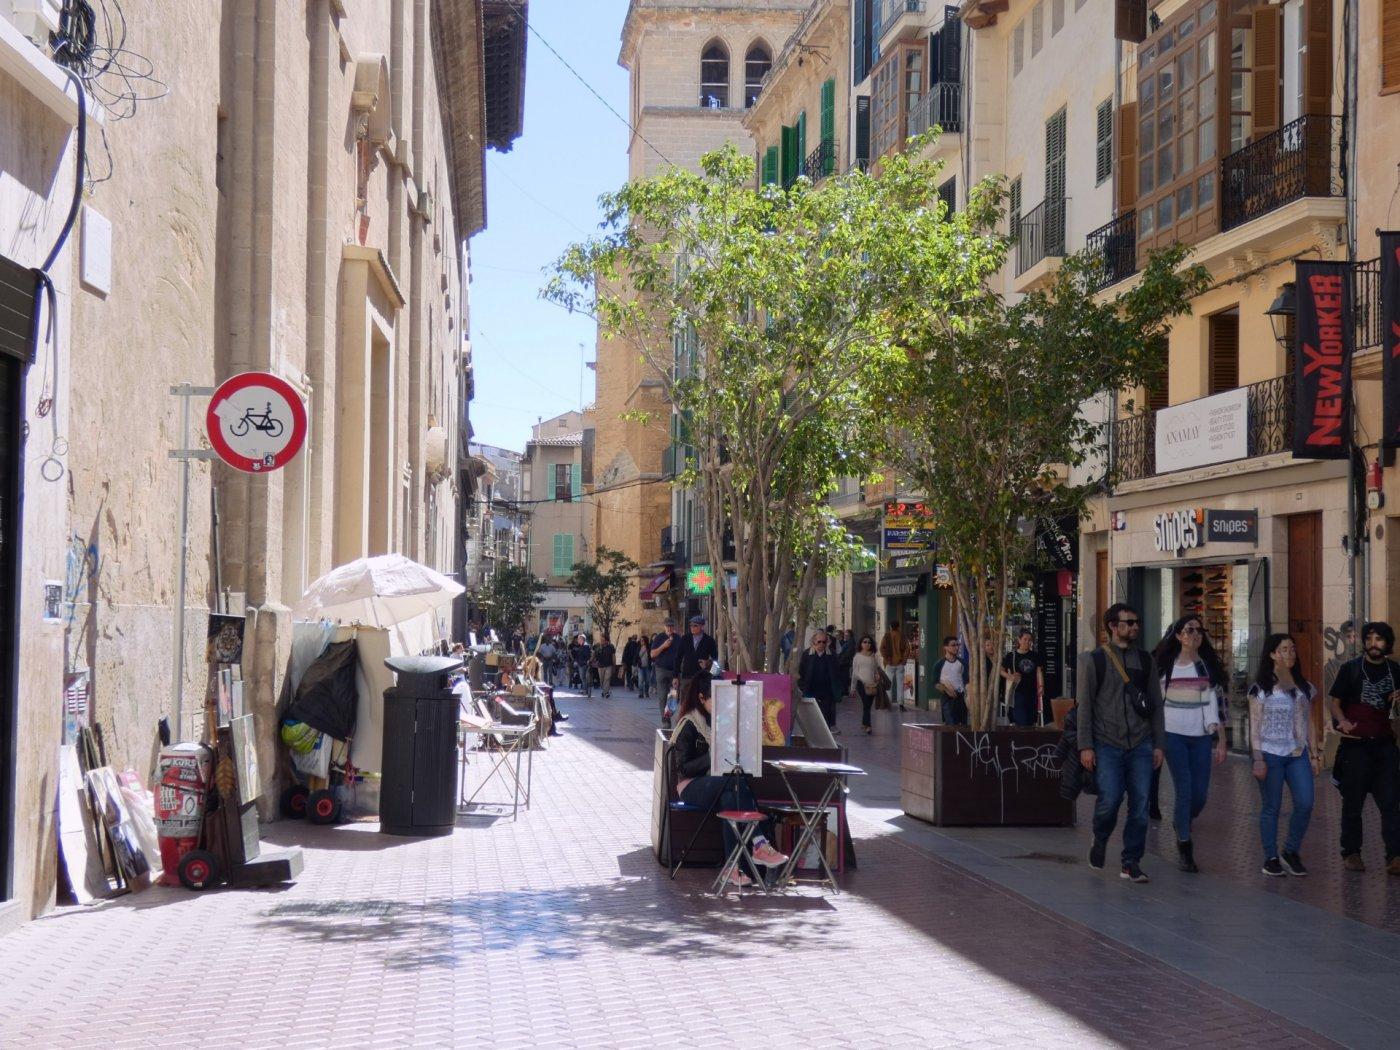 Despacho-Venta-Palma de Mallorca-185572-Foto-32